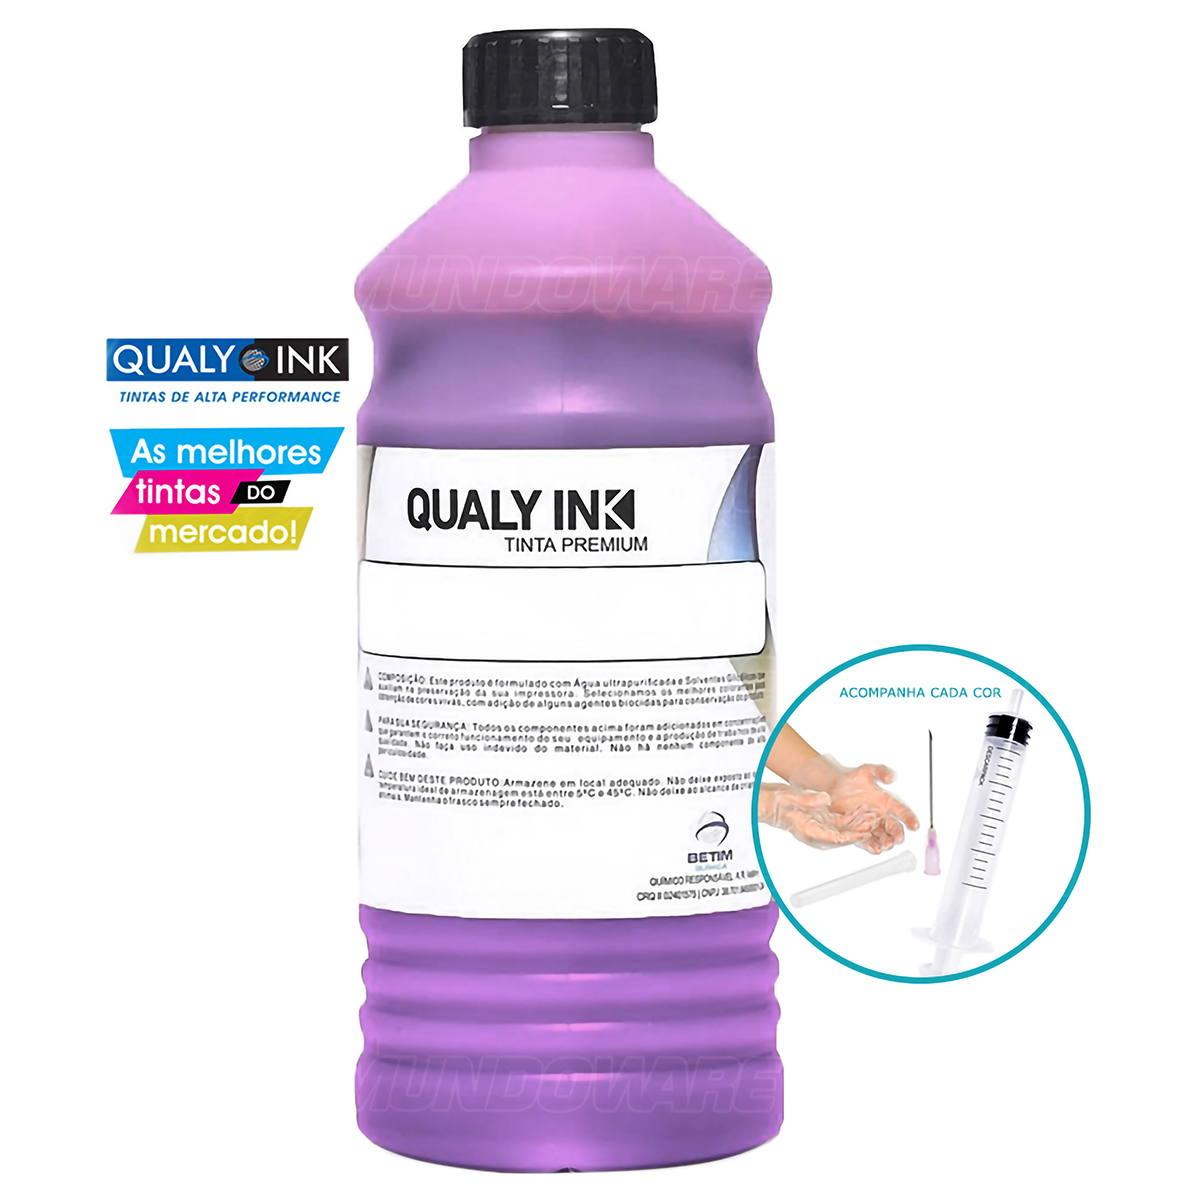 Compatível: Tinta Corante Qualy-Ink MC3E-1513 Série 673 para Epson L800 L805 L810 L850 L1800 Magenta 1L